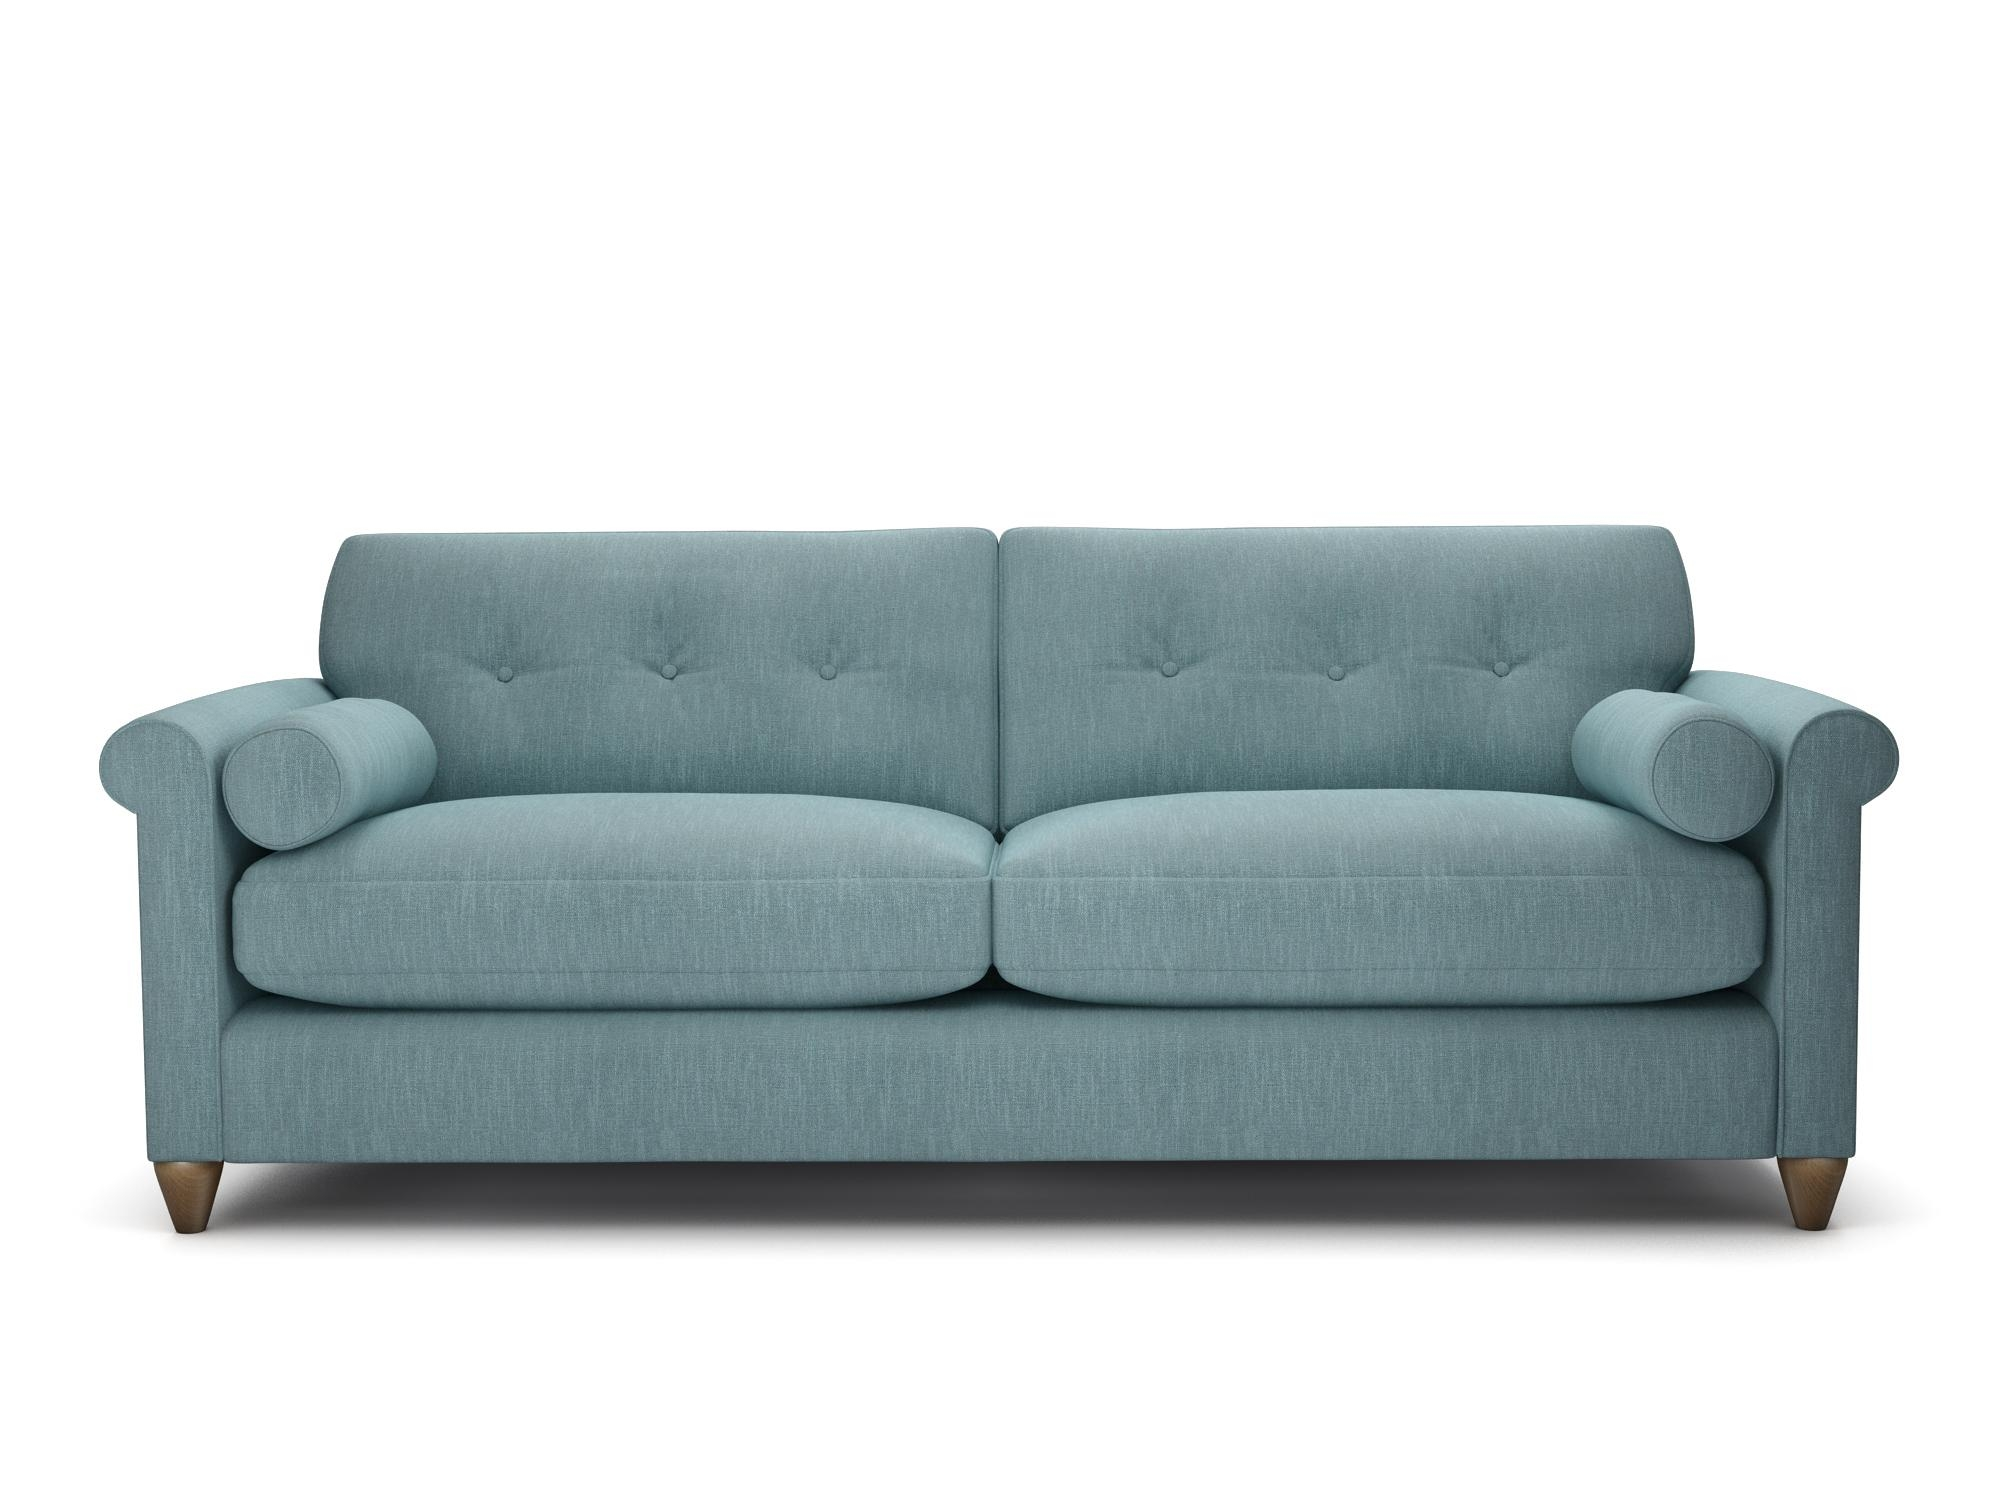 Furniture: Cozy Ava Velvet Tufted Sleeper Sofa For Home Furniture Regarding Ava Tufted Sleeper Sofas (View 8 of 20)